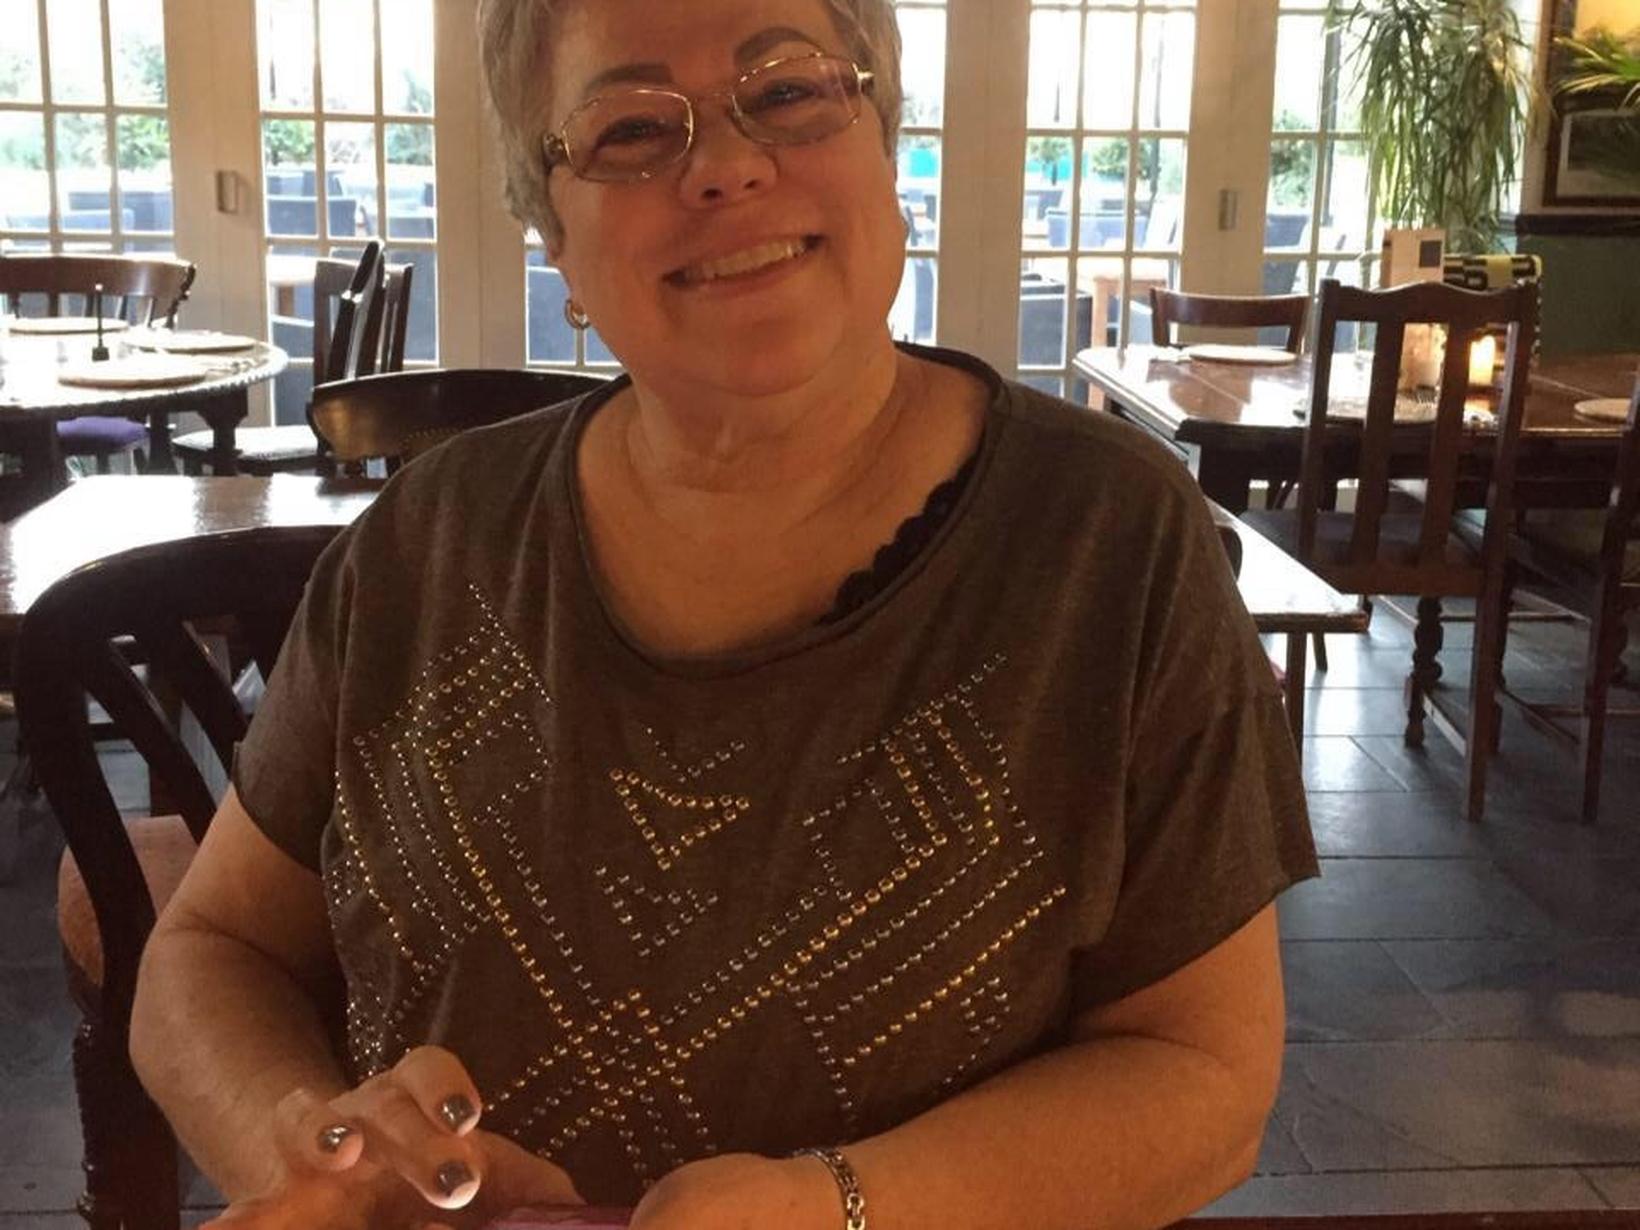 Deborah from Orlando, Florida, United States